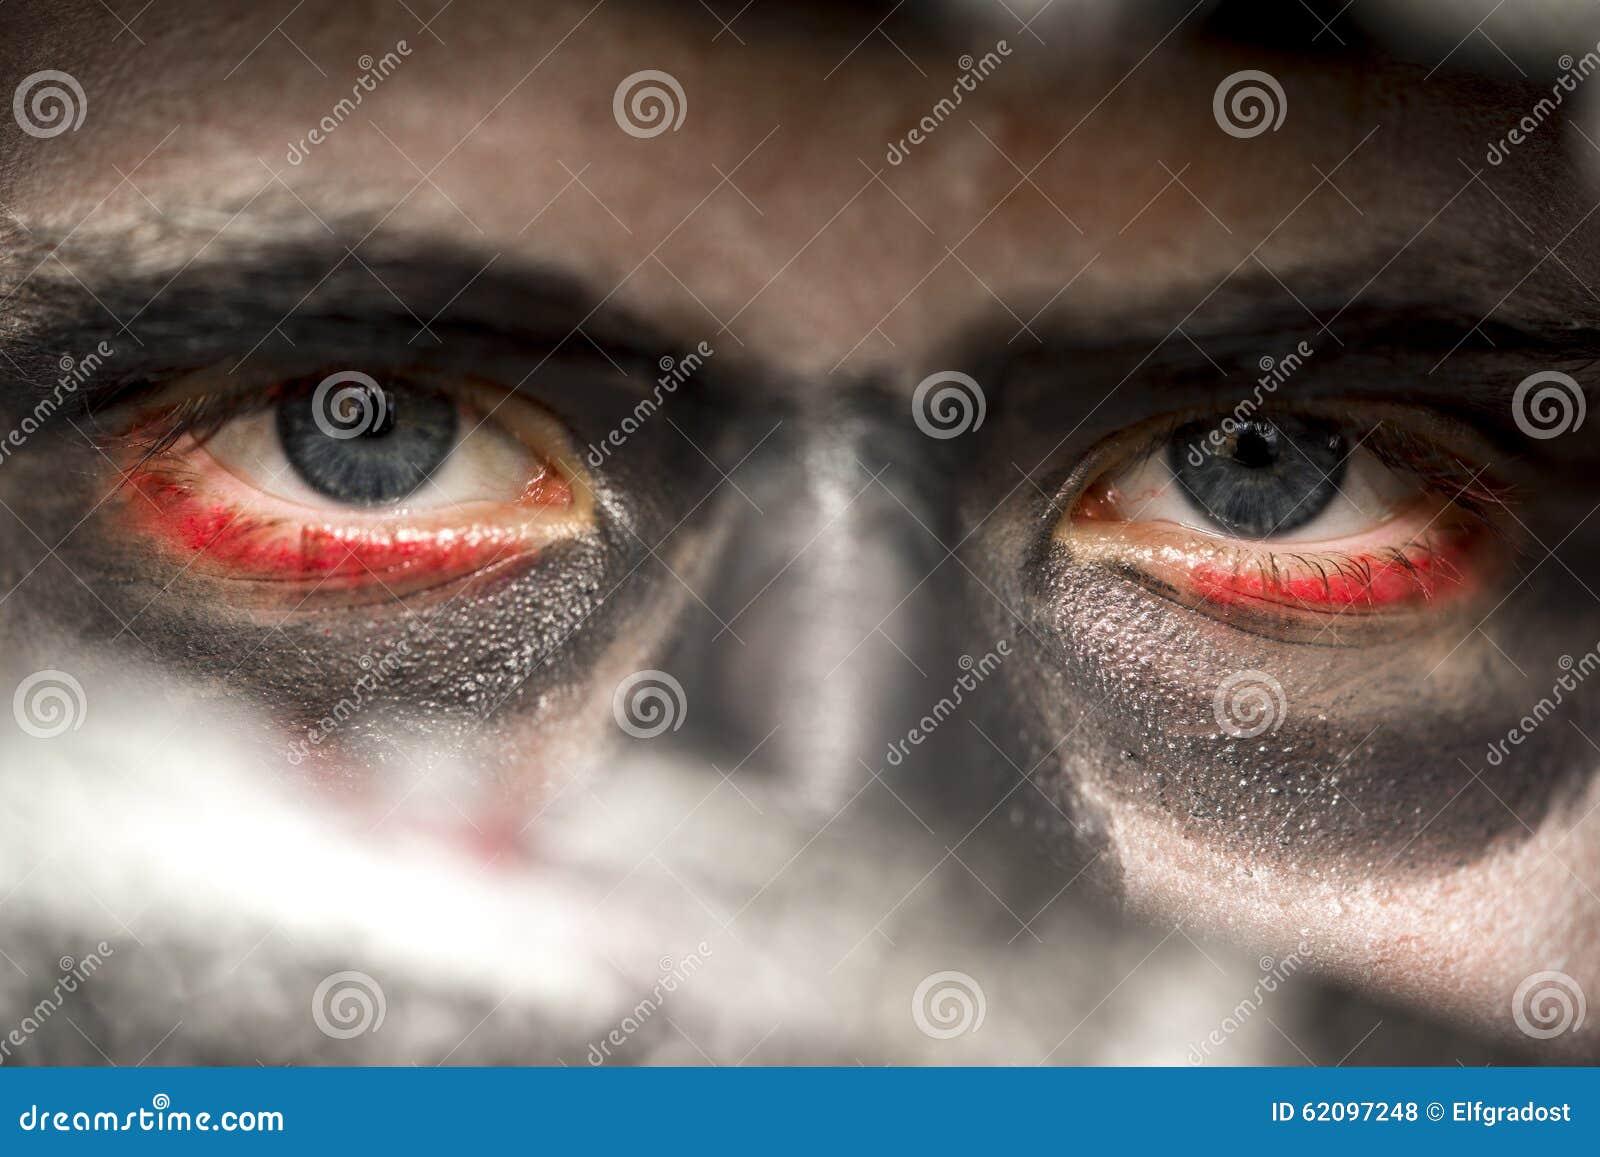 Eyes Of A Man Wearing Skull Makeup Stock Photo Image Of Creepy